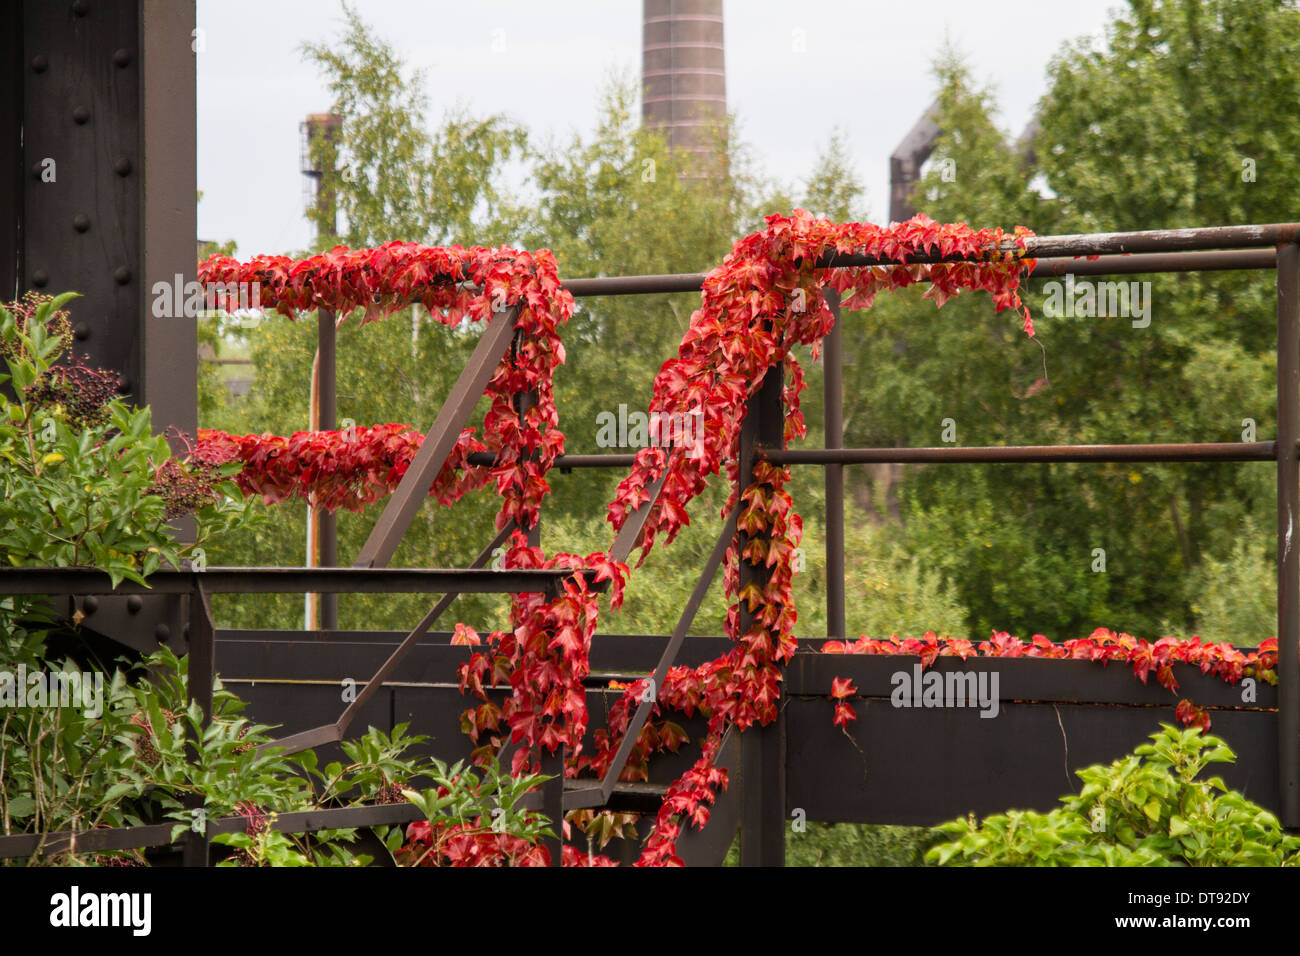 Landschaftpark Duisburg Nord Ivy overgrowing railings - Stock Image